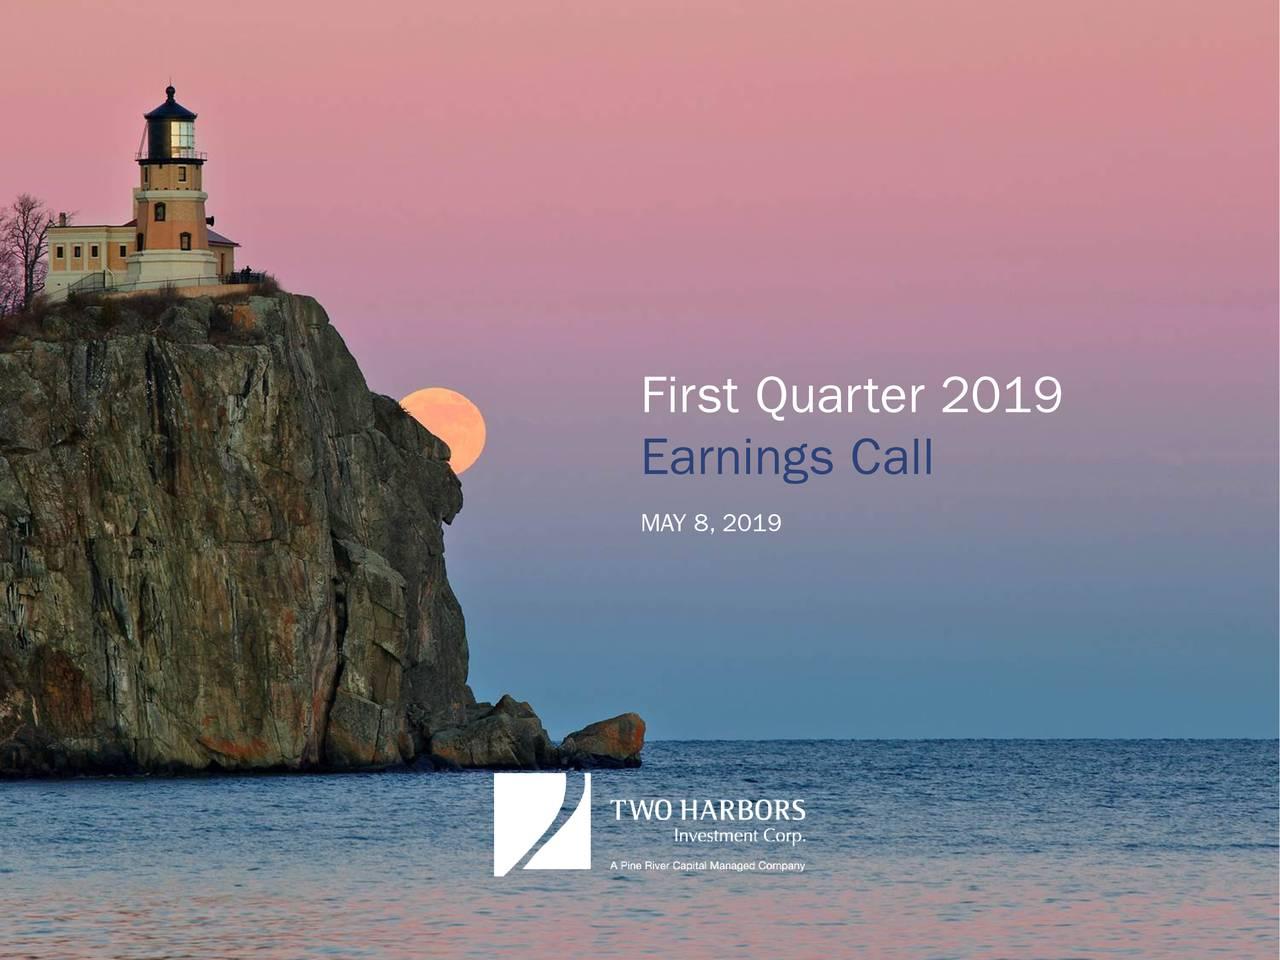 Earnings Call MAY 8, 2019